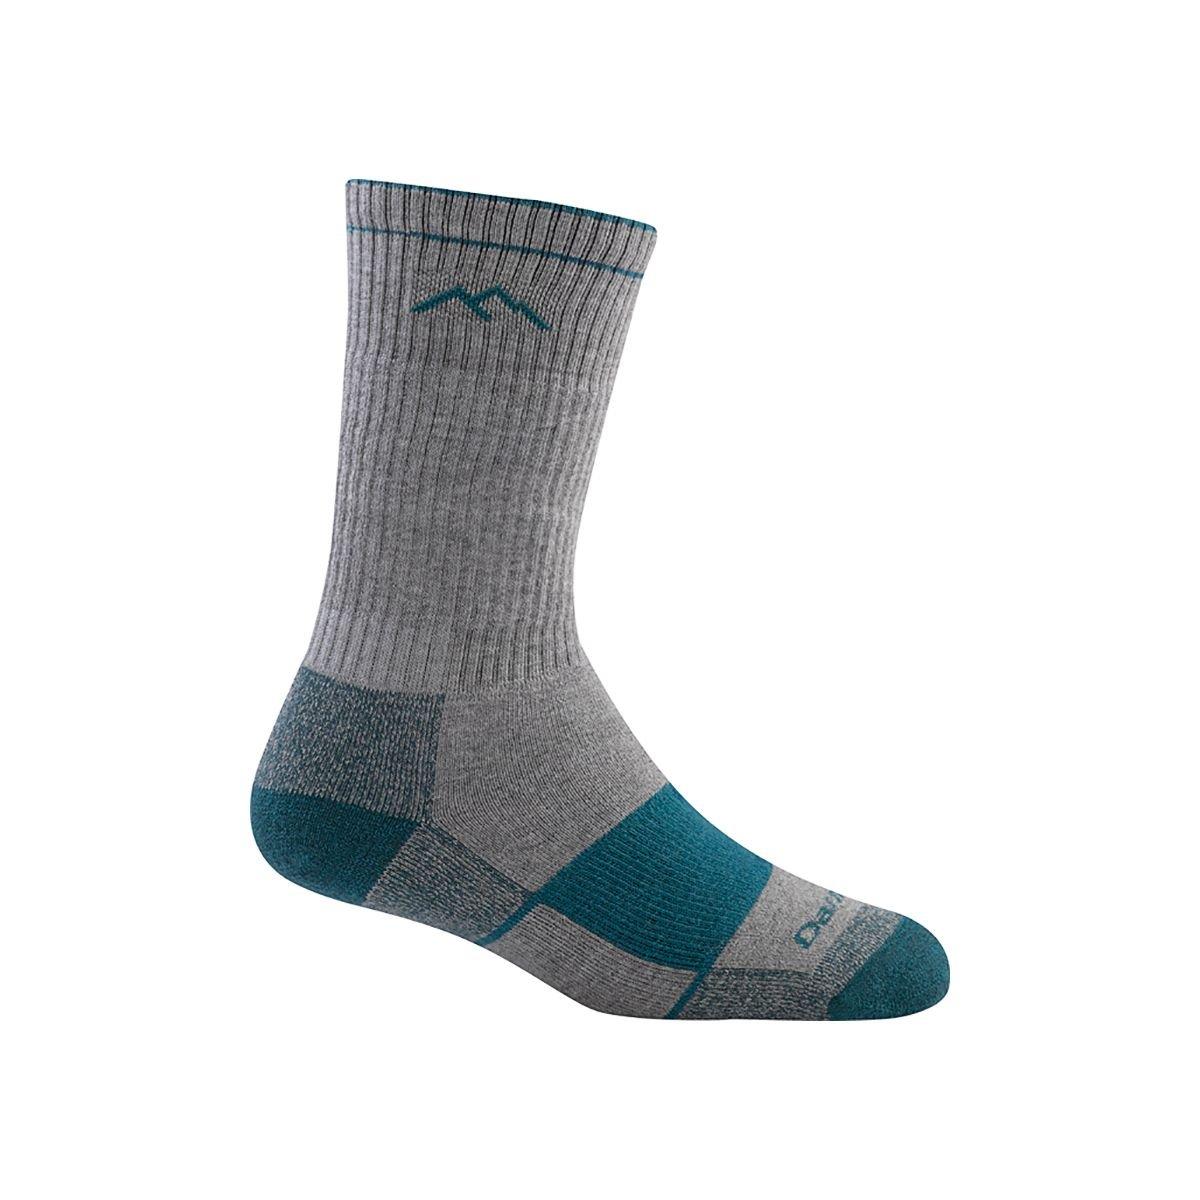 Darn Tough Coolmax Boot Full Cushion Socks - Women's 1934